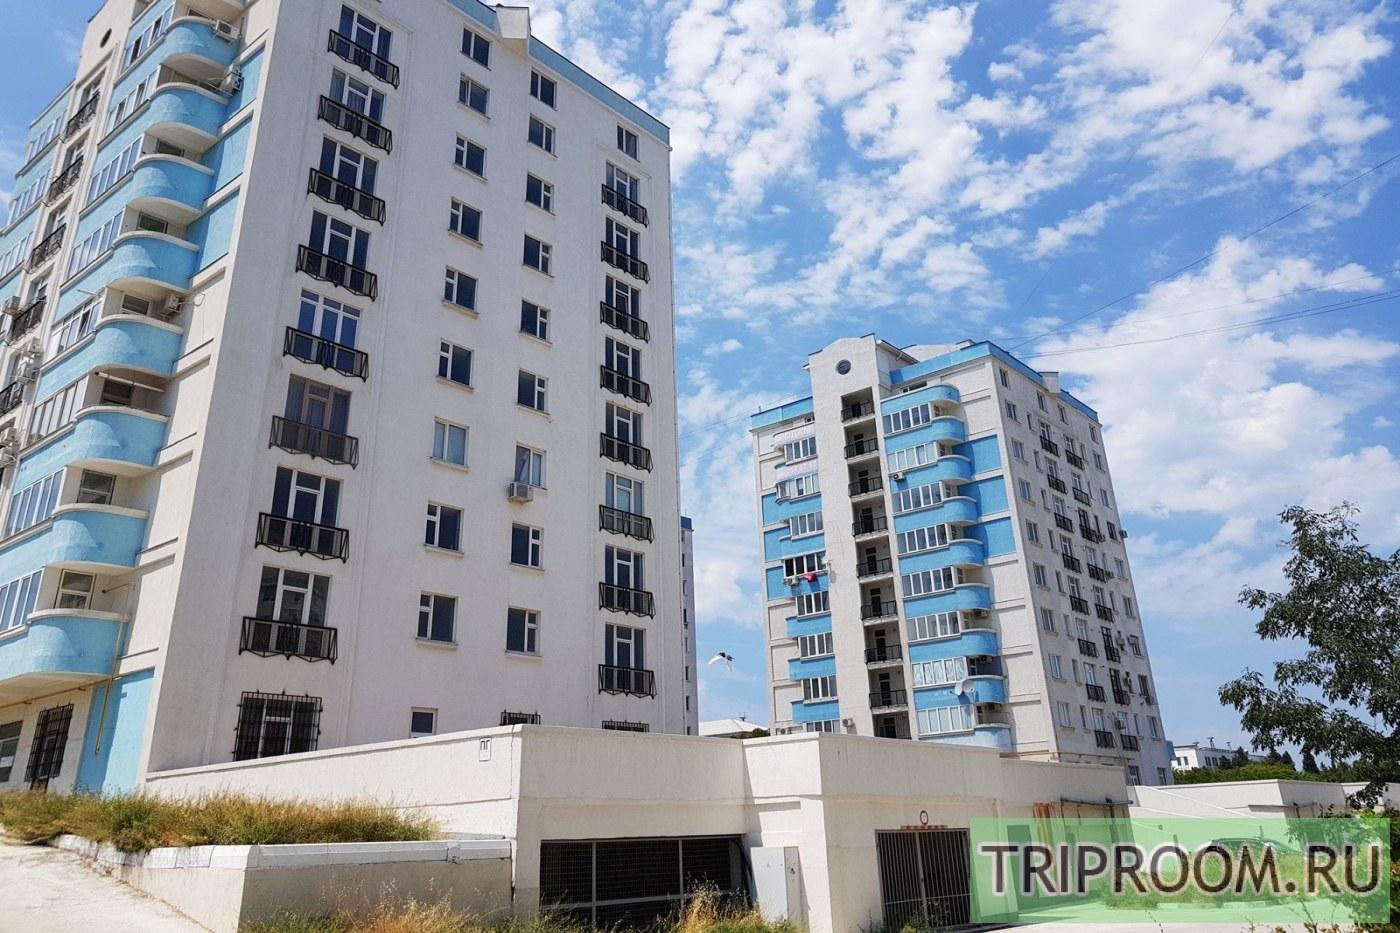 2-комнатная квартира посуточно (вариант № 657), ул. Дыбенко улица, фото № 12